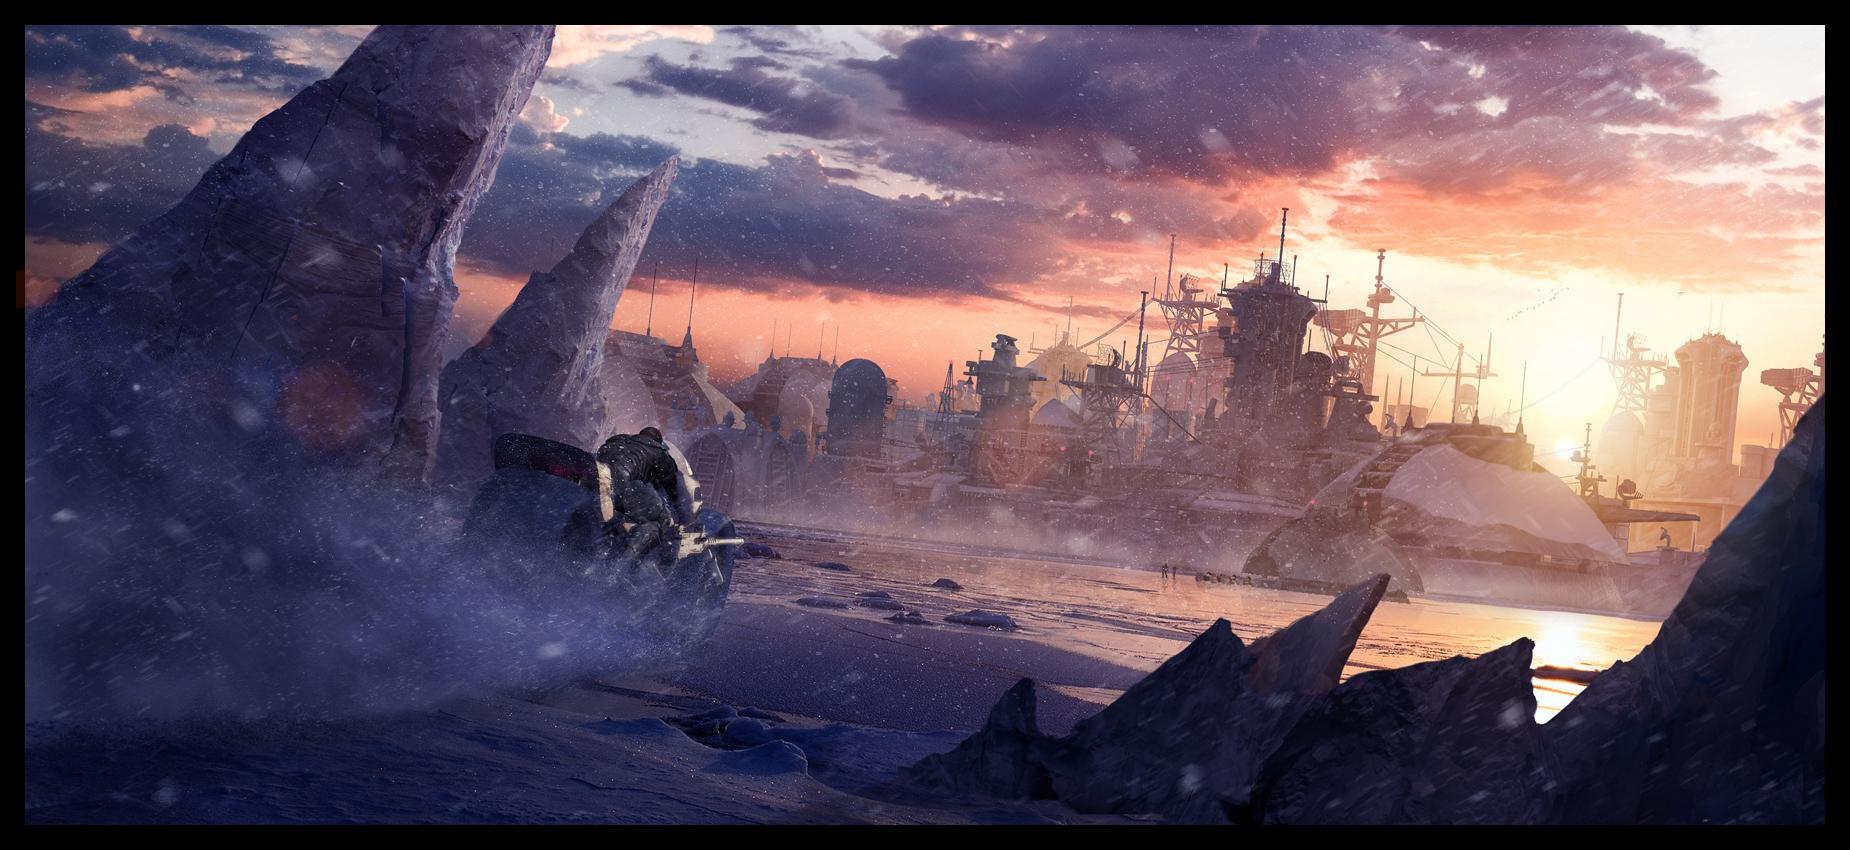 Arctic base by glazyrin